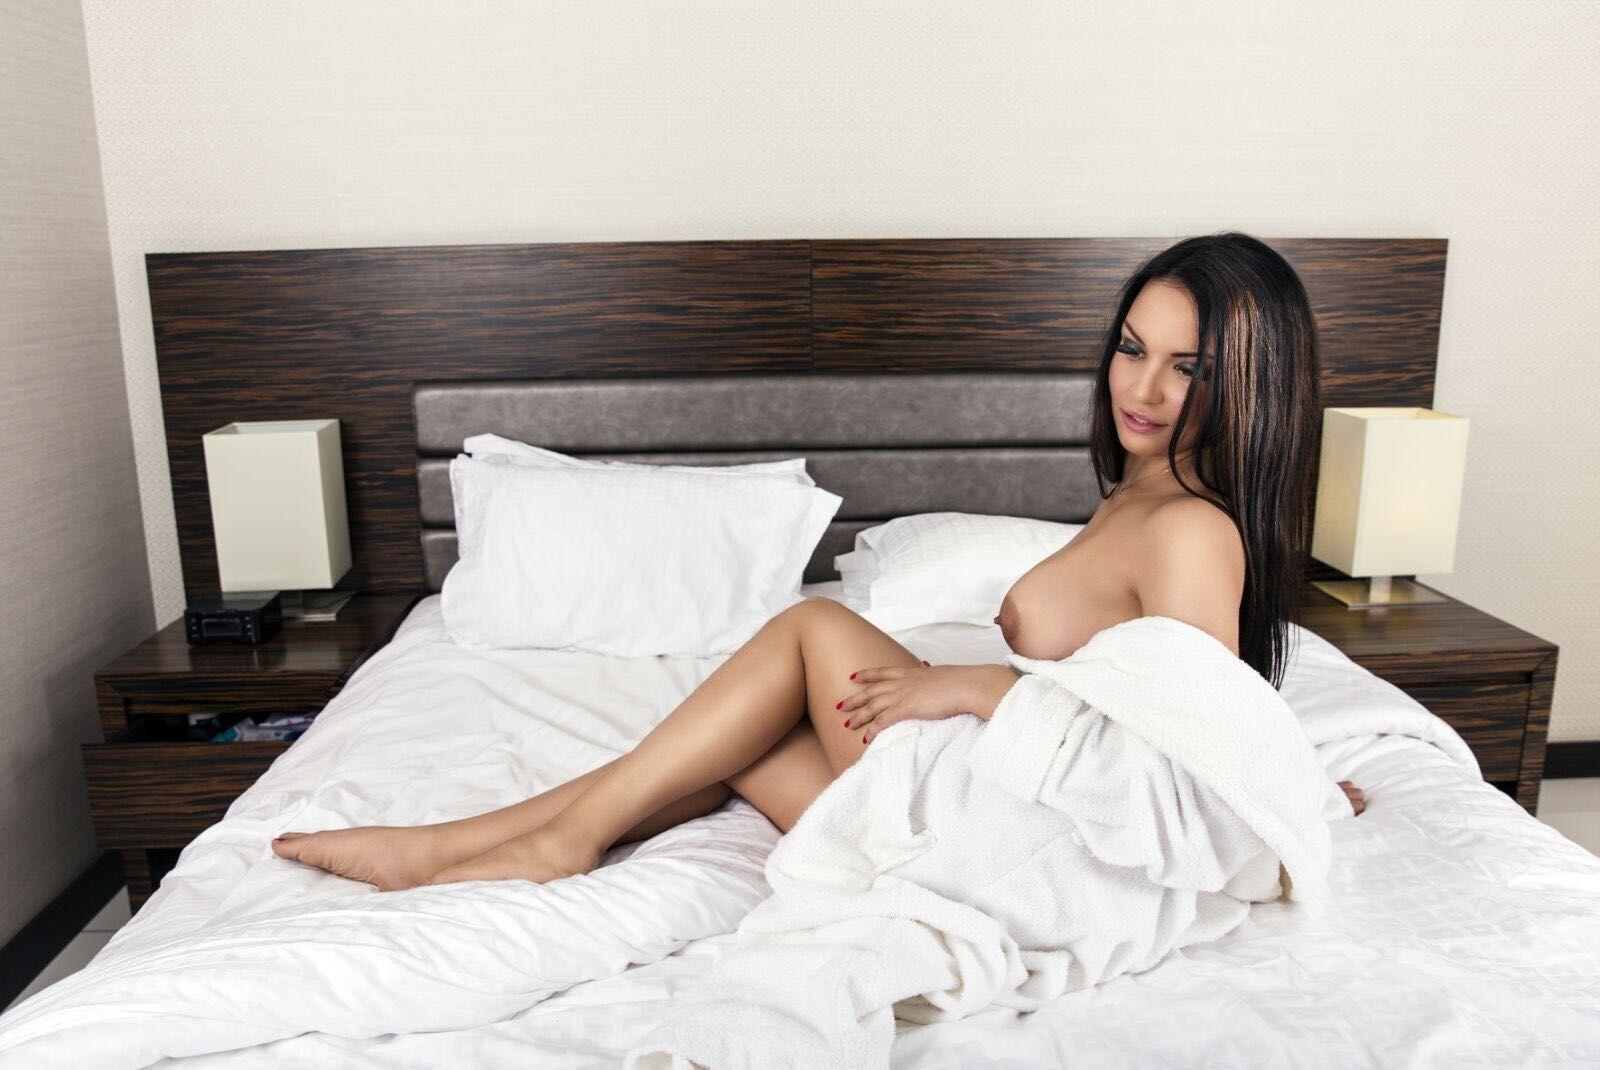 SEX SHOP LAPPEENRANTA MILF MASSAGE VIDEOS